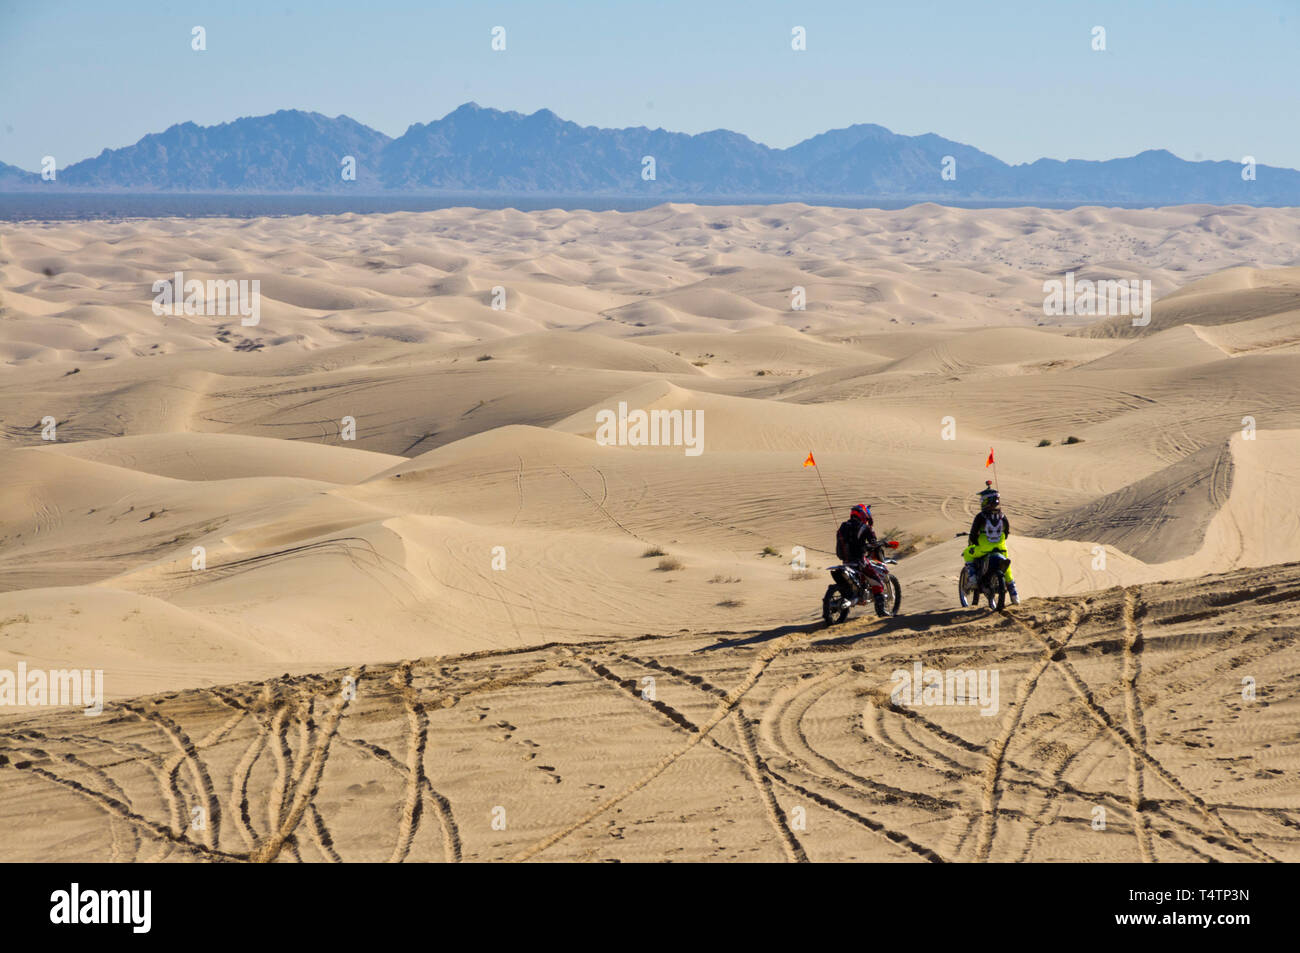 Imperial Sand Dunes, California Stock Photo   Alamy